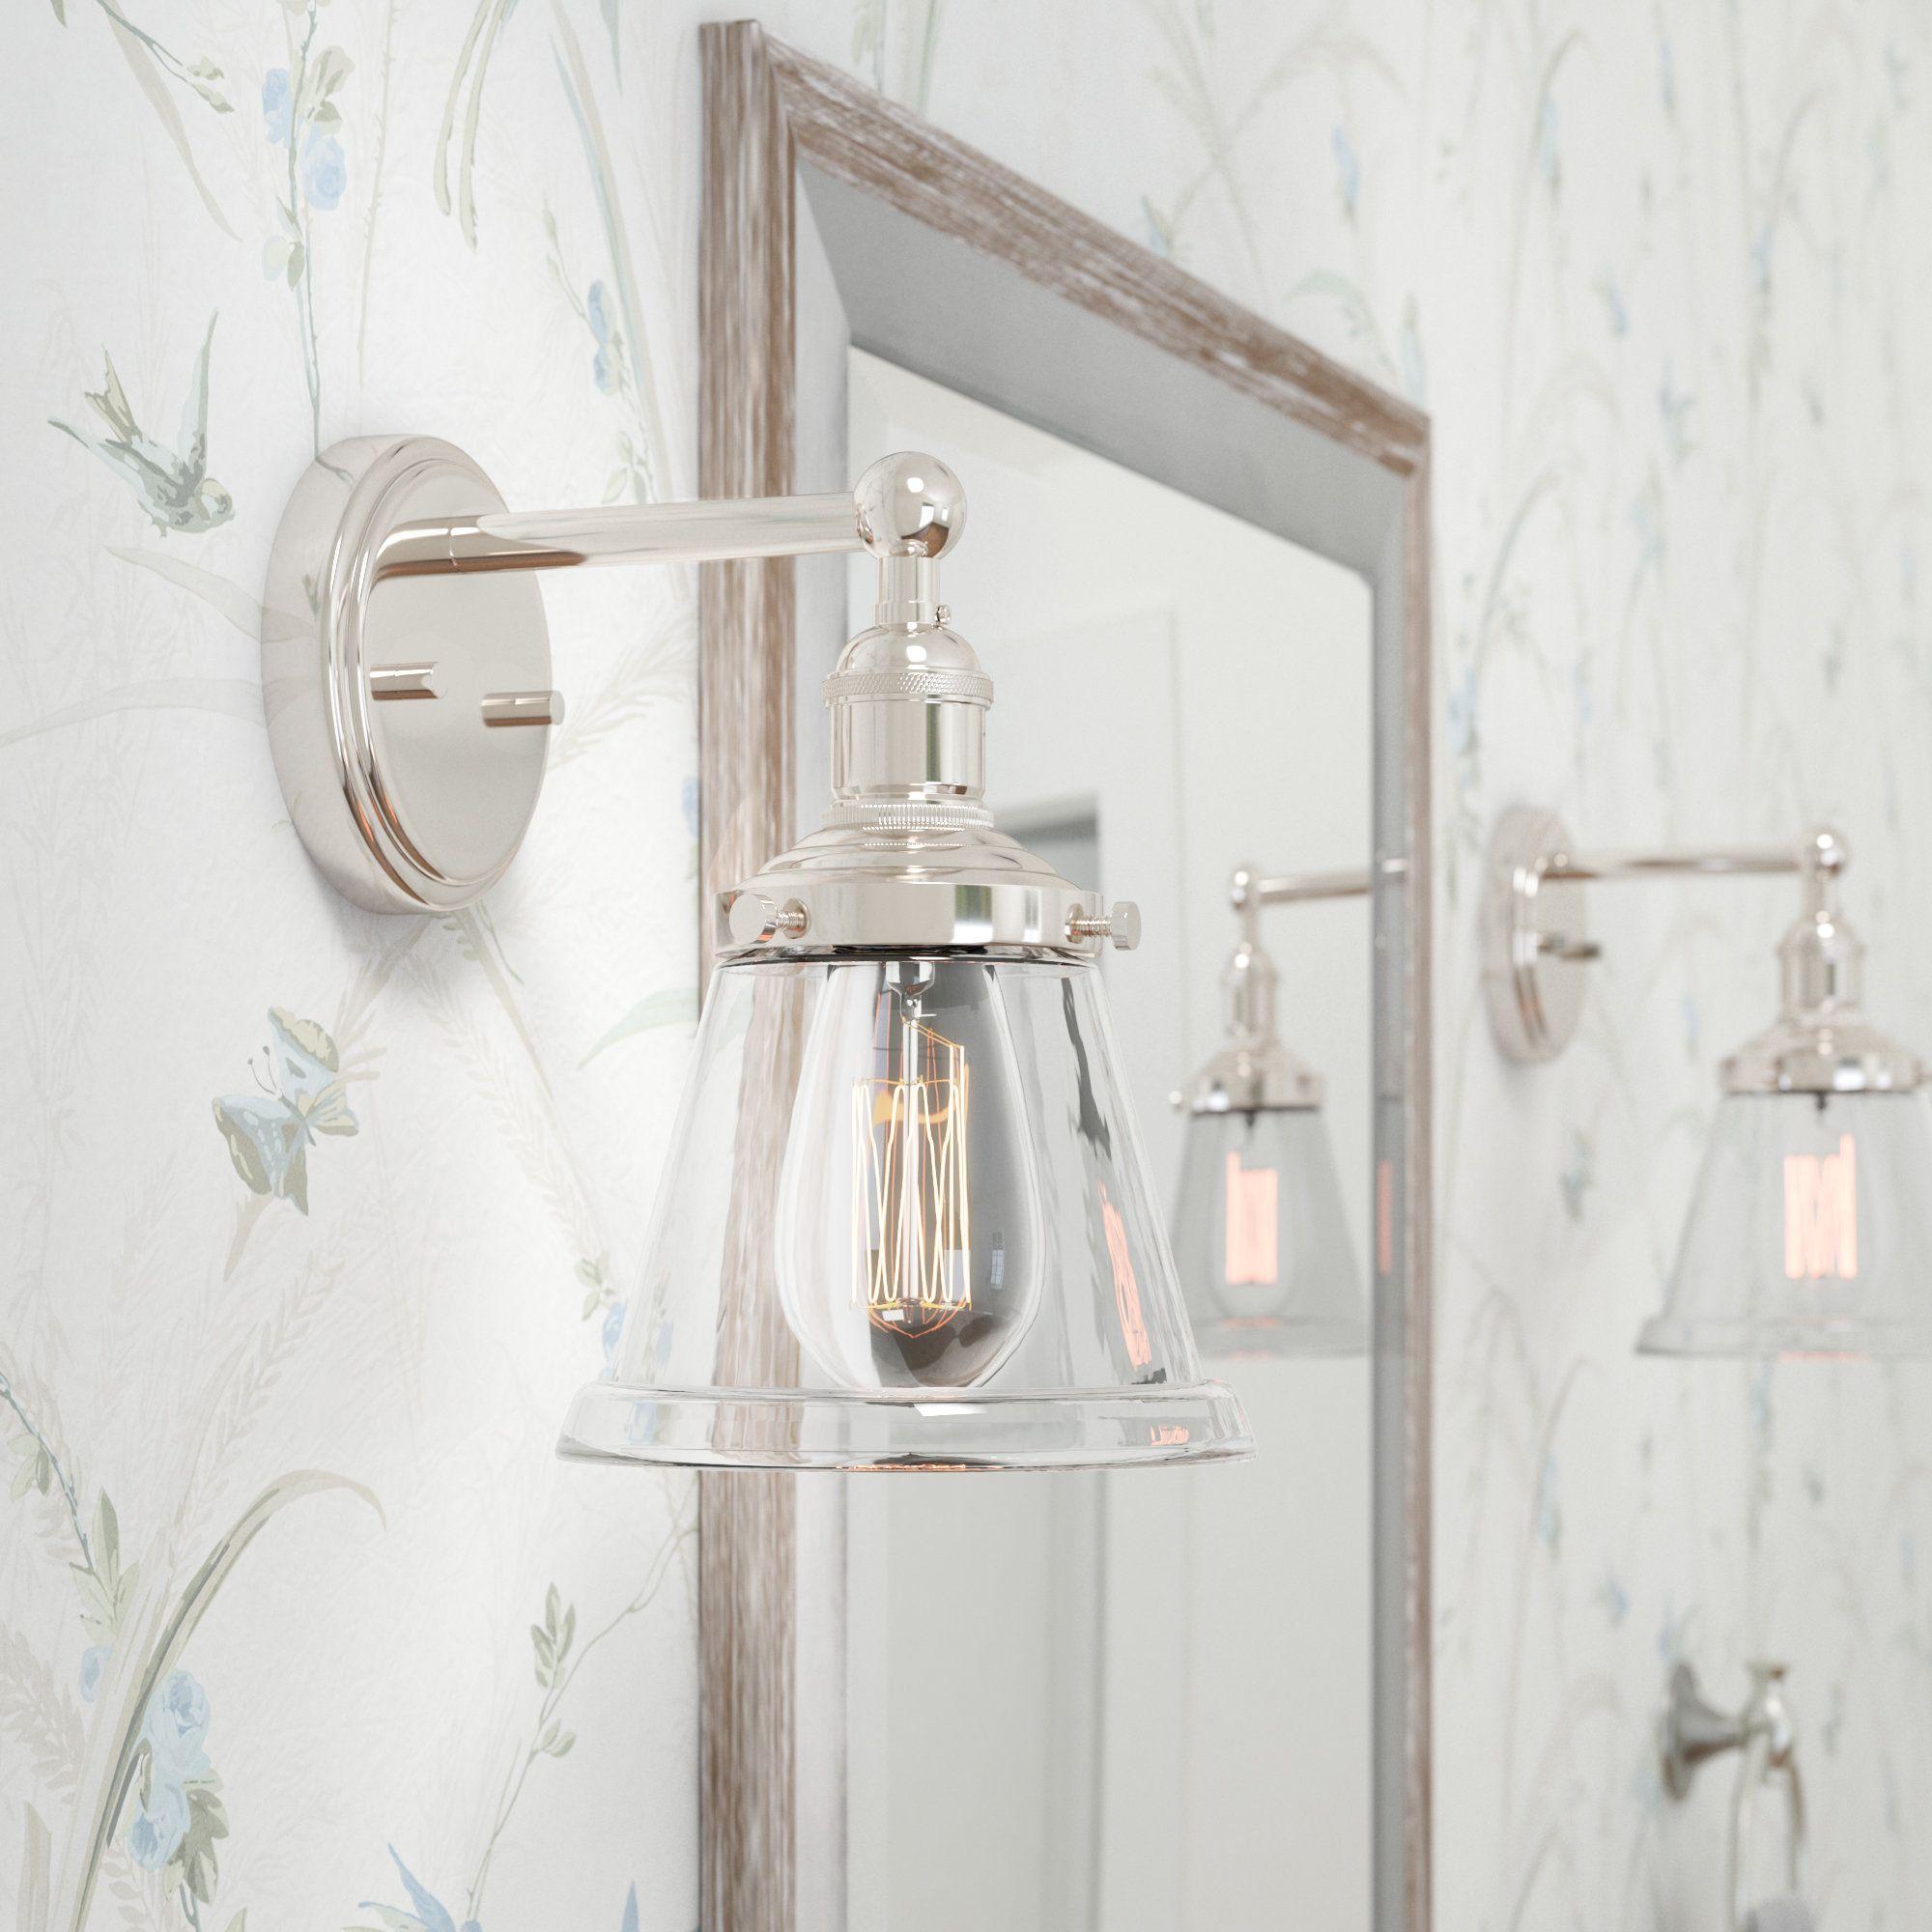 14 Visual Comfort Sconce With Glass Shade Bathroom Sconces Bathroom Light Fixtures Sconces